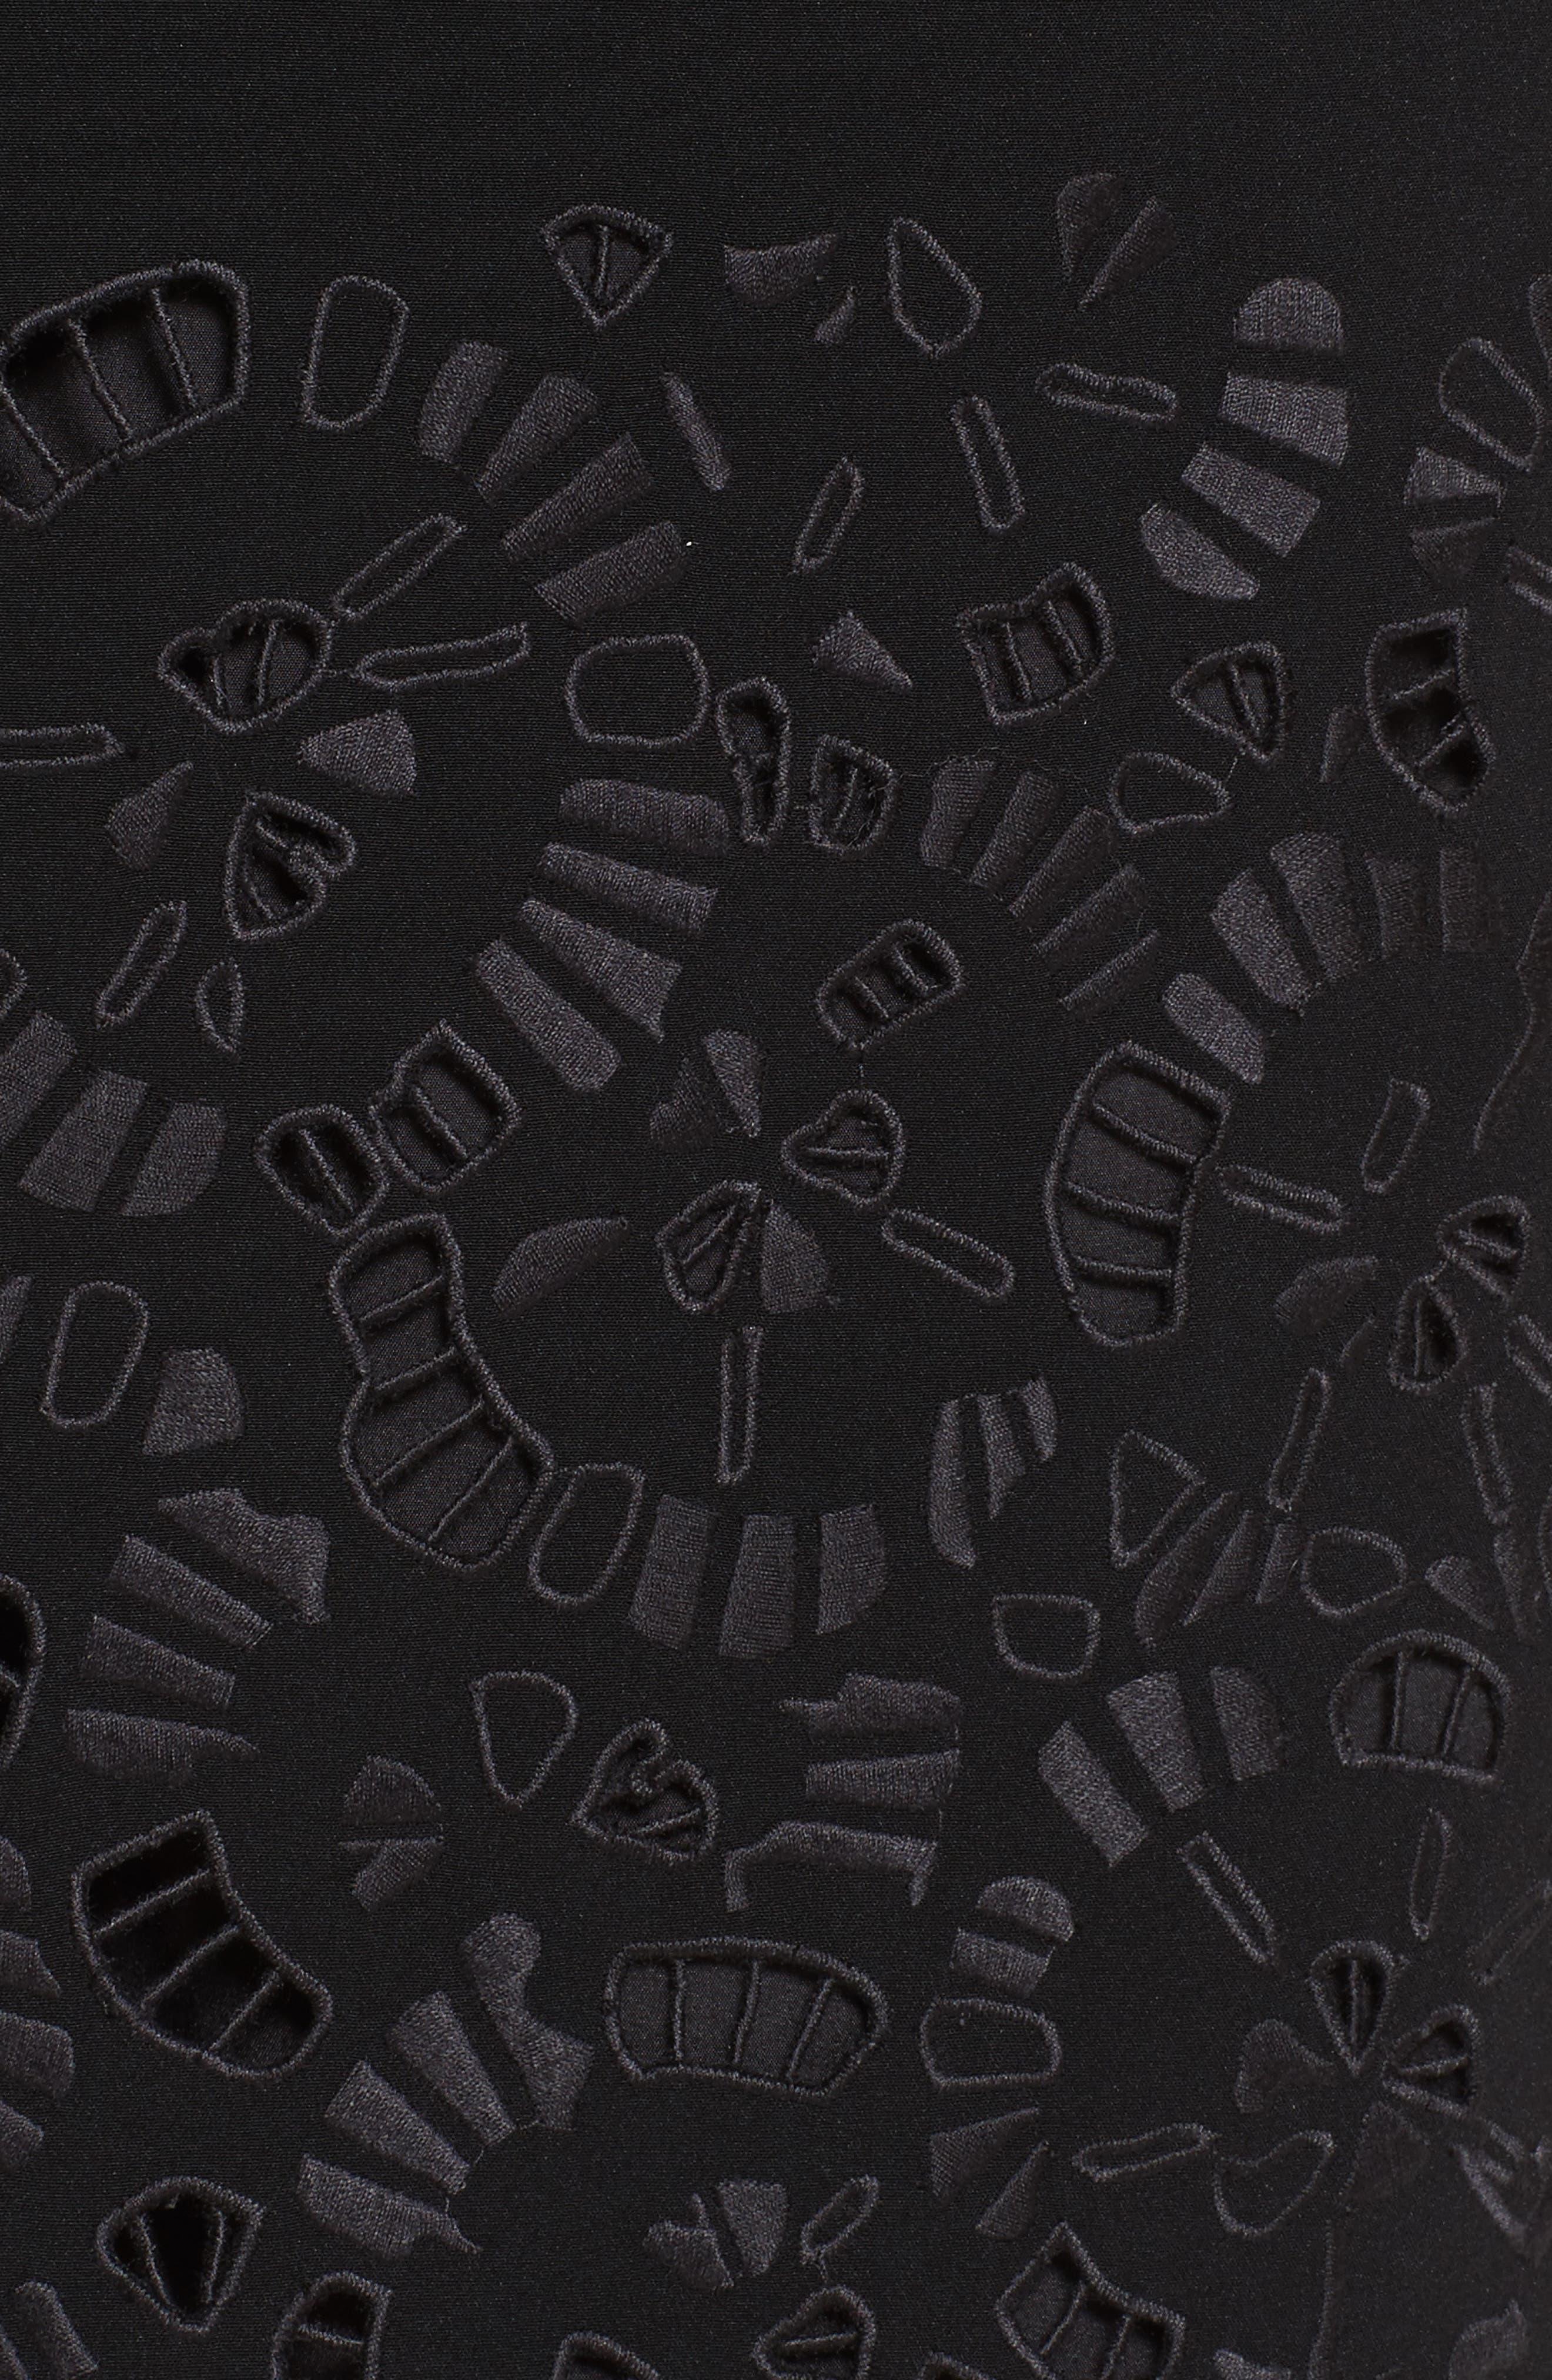 Corbin Embroidered Laser Cut Dress,                             Alternate thumbnail 6, color,                             Black